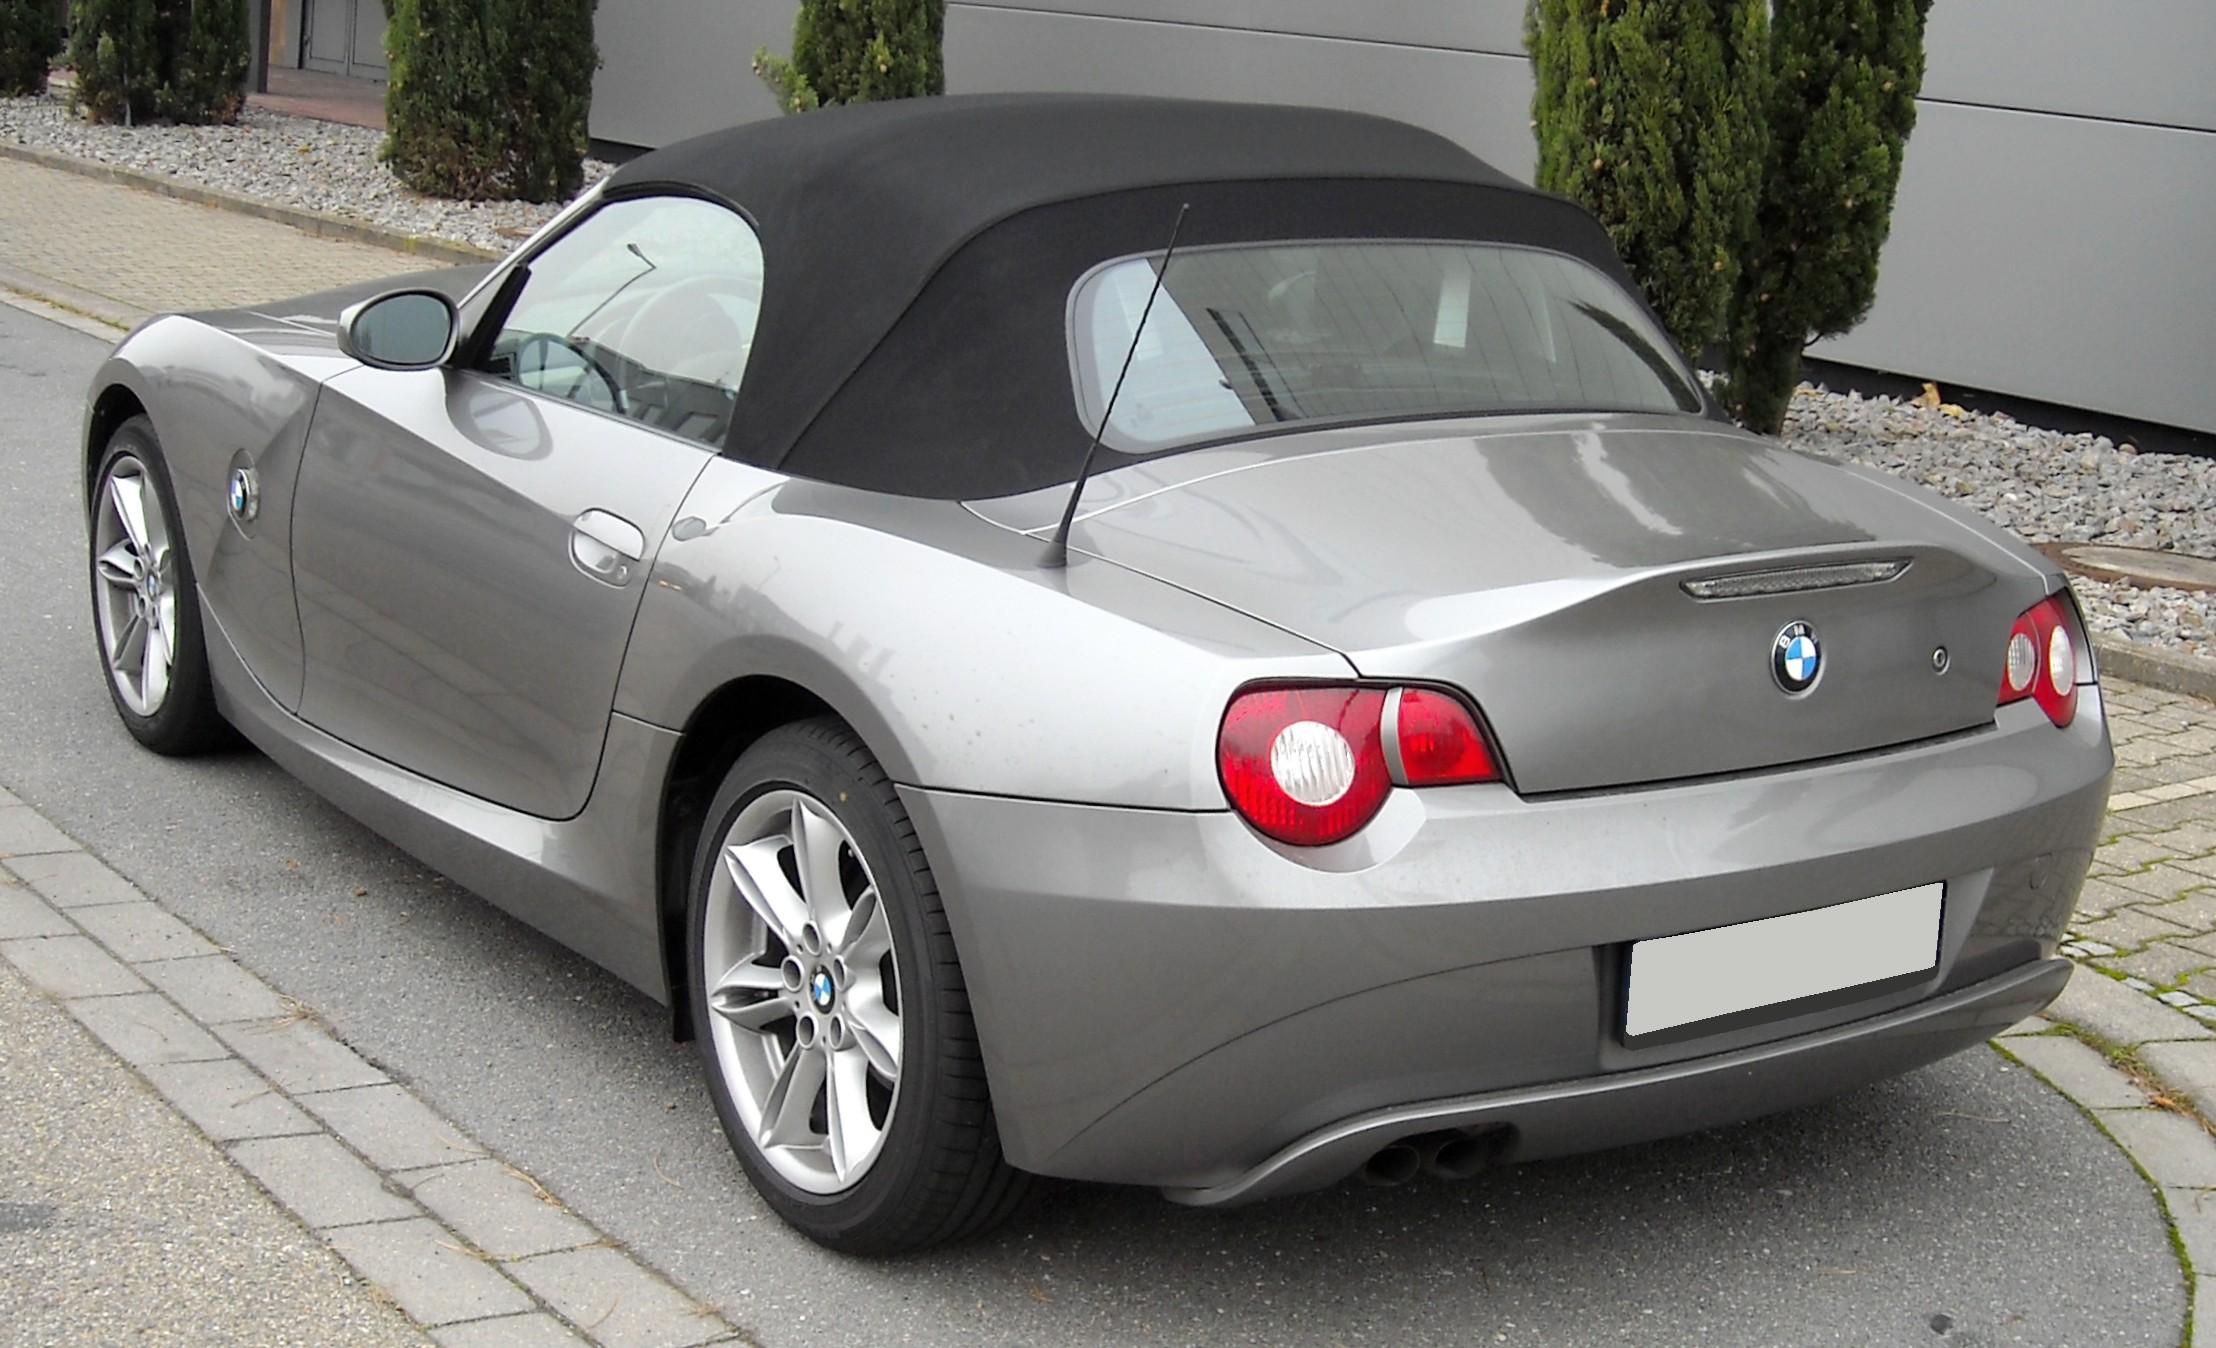 File:BMW Z4 rear 20081201.jpg